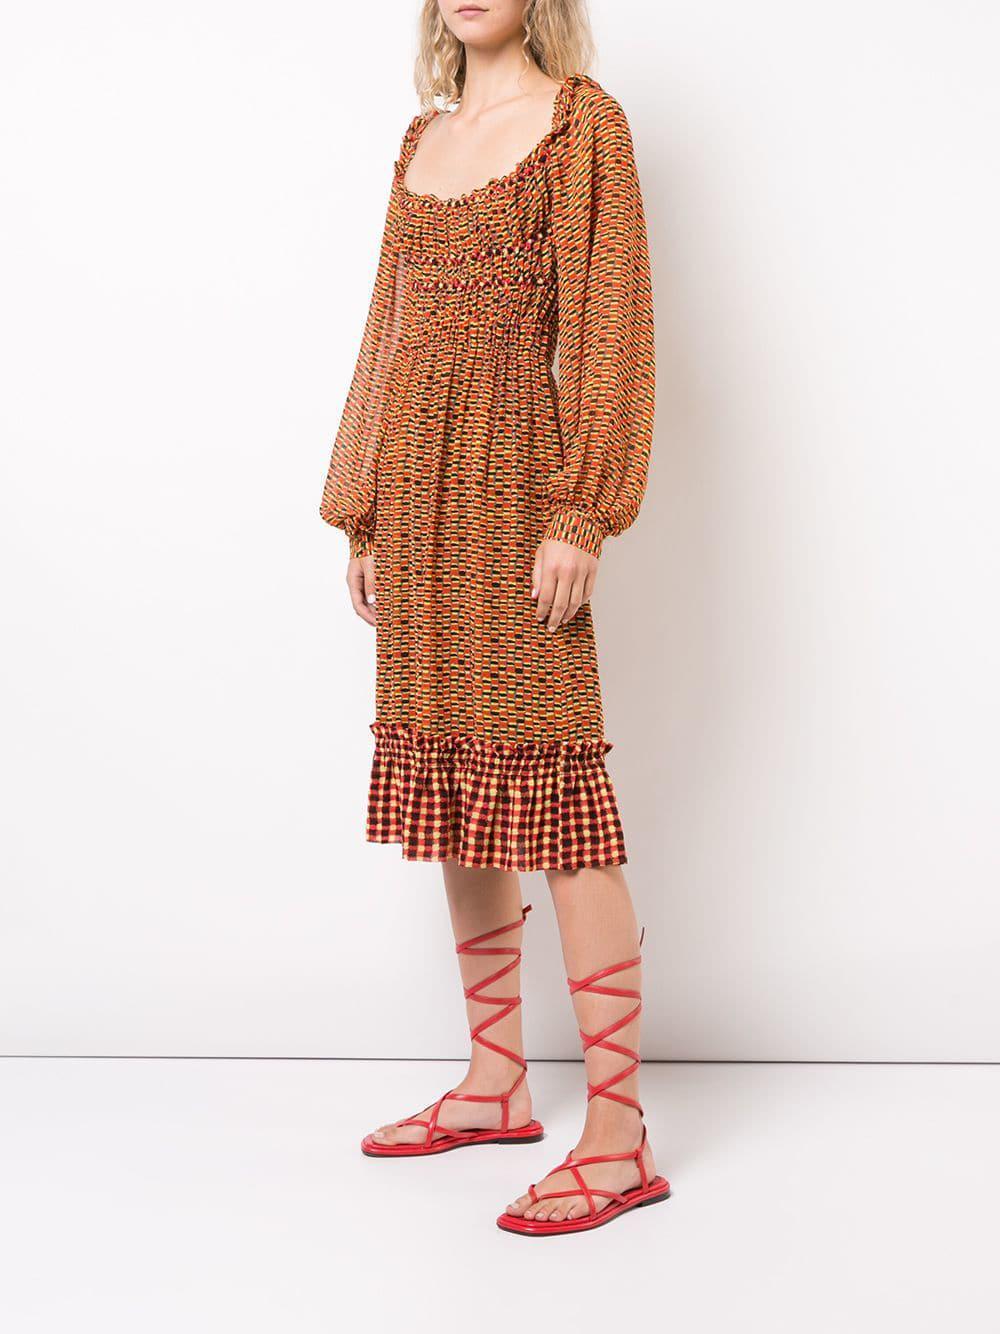 a17c0f50d7540 Proenza Schouler - Yellow Crepe Chiffon Square Neck Dress - Lyst. View  fullscreen